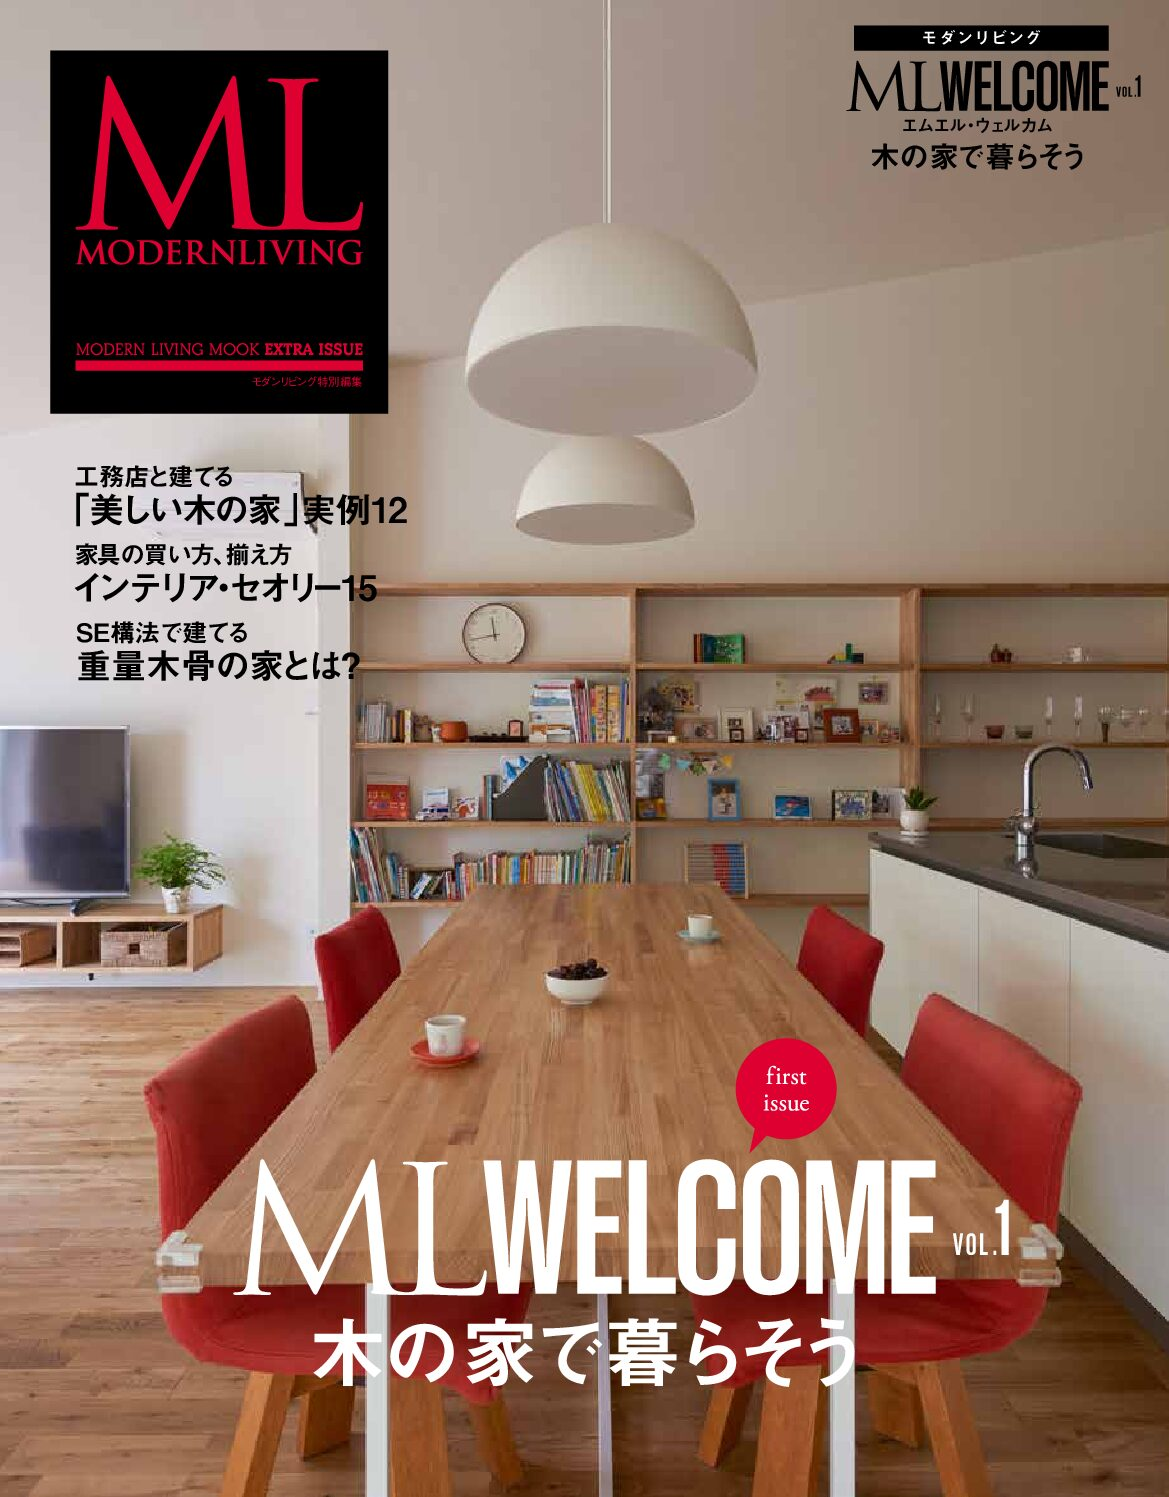 MLWELCOME vol.12 掲載物件応募フォーム